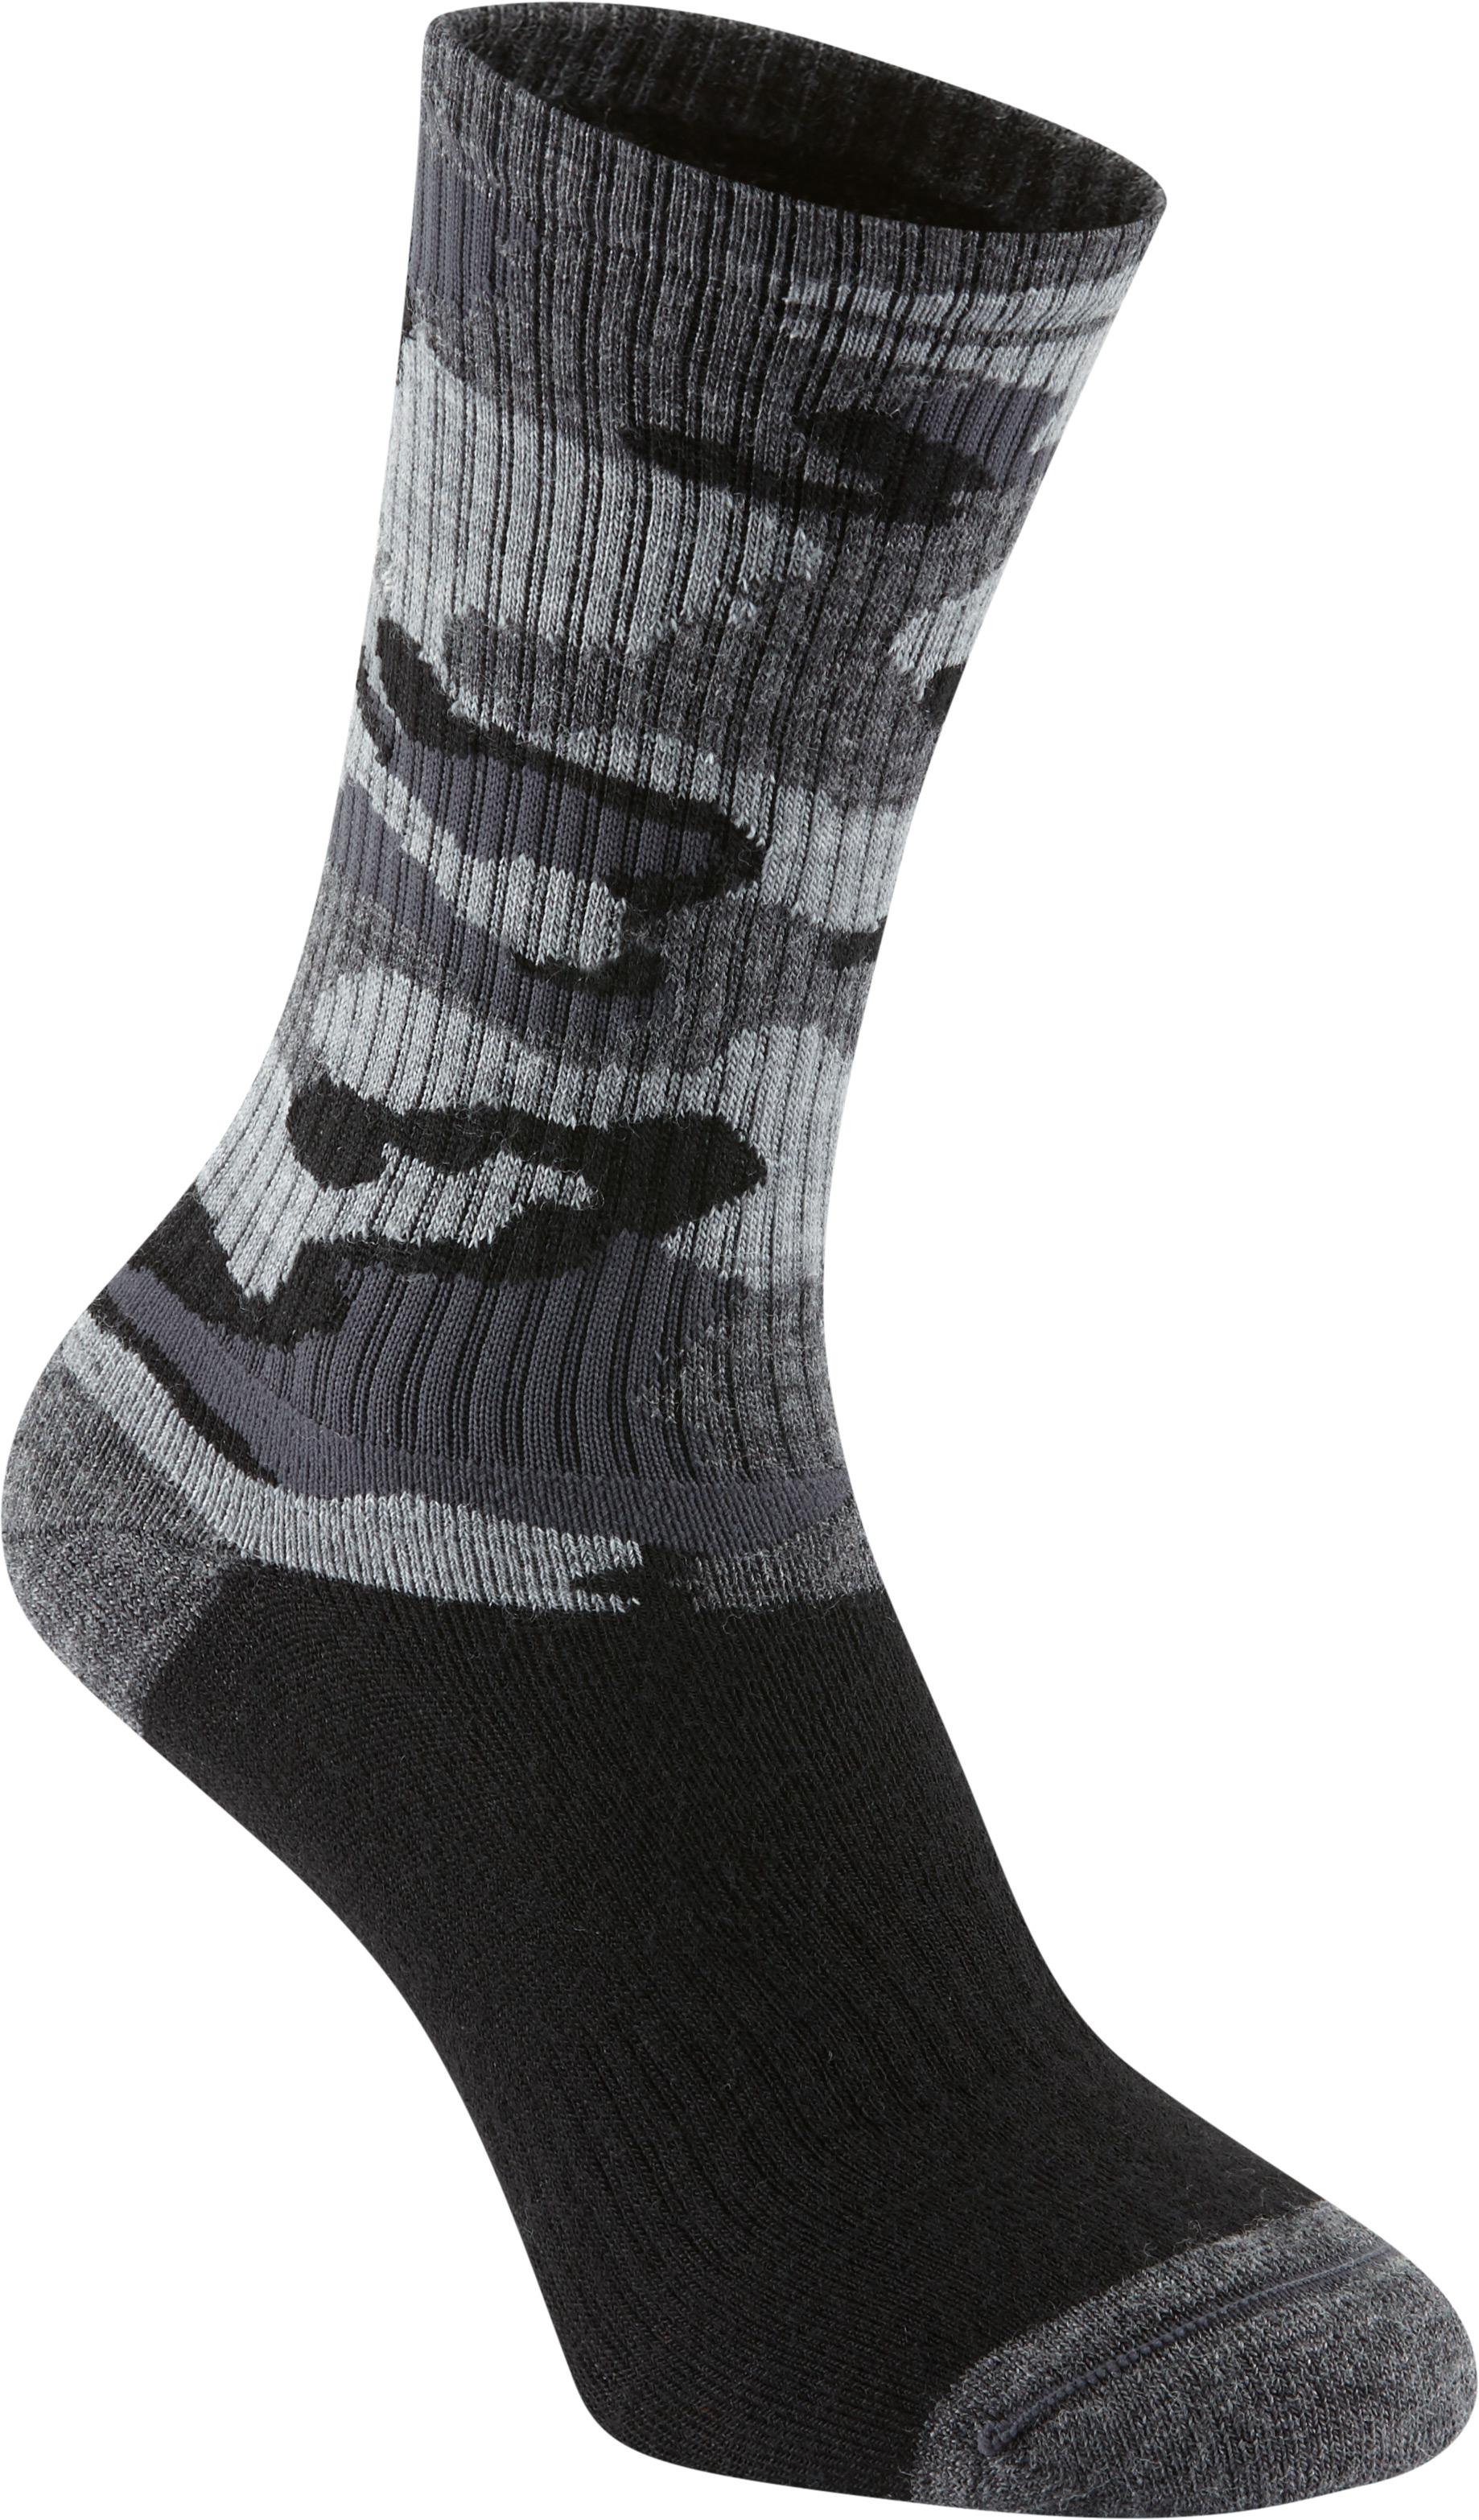 Madison Isoler Merino Wool Deep Winter Socks Camouflage